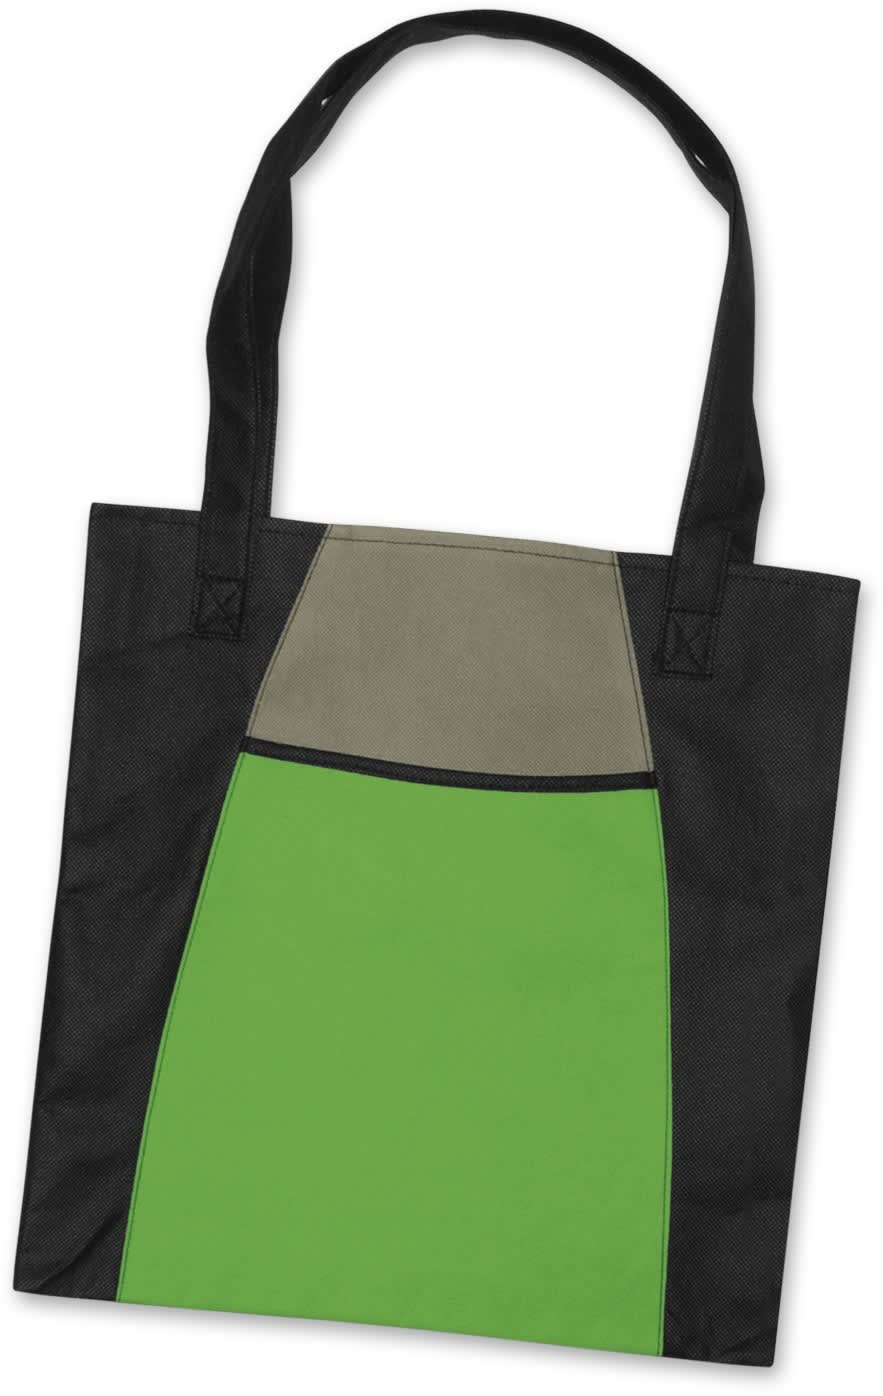 Bright Green/Black Promo Fashionable Tote Bag